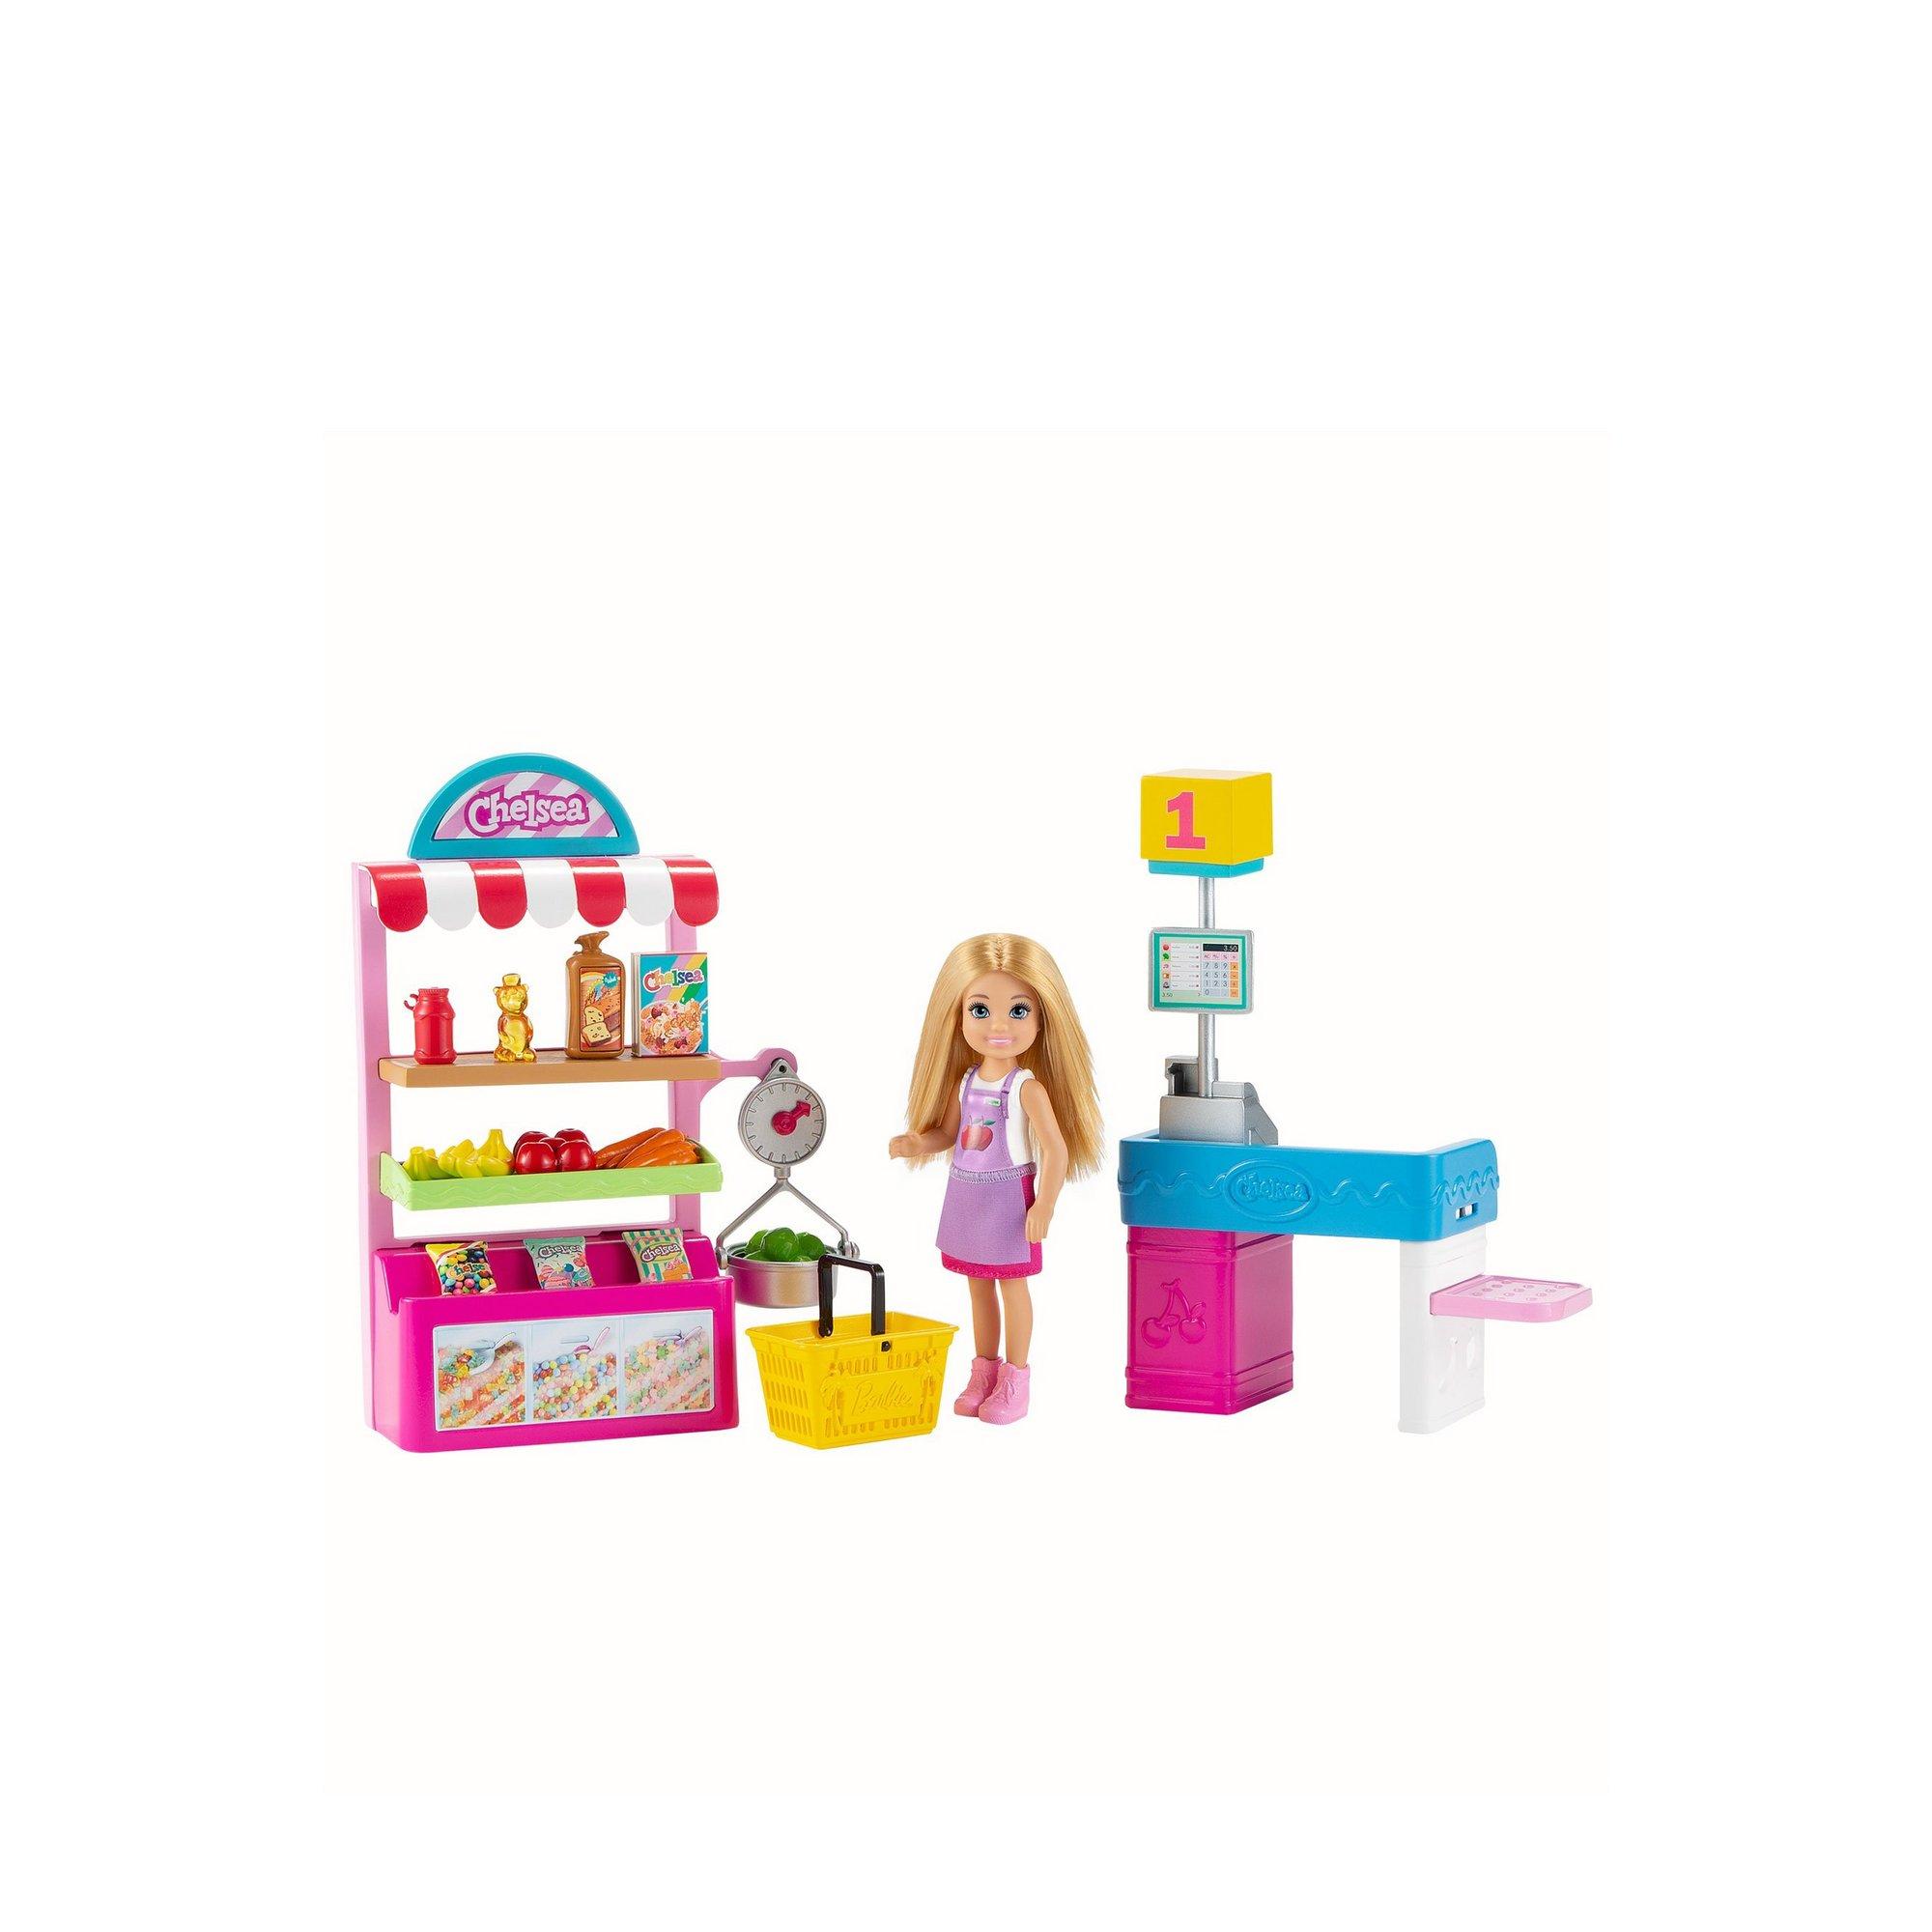 Image of Barbie Chelsea Supermarket